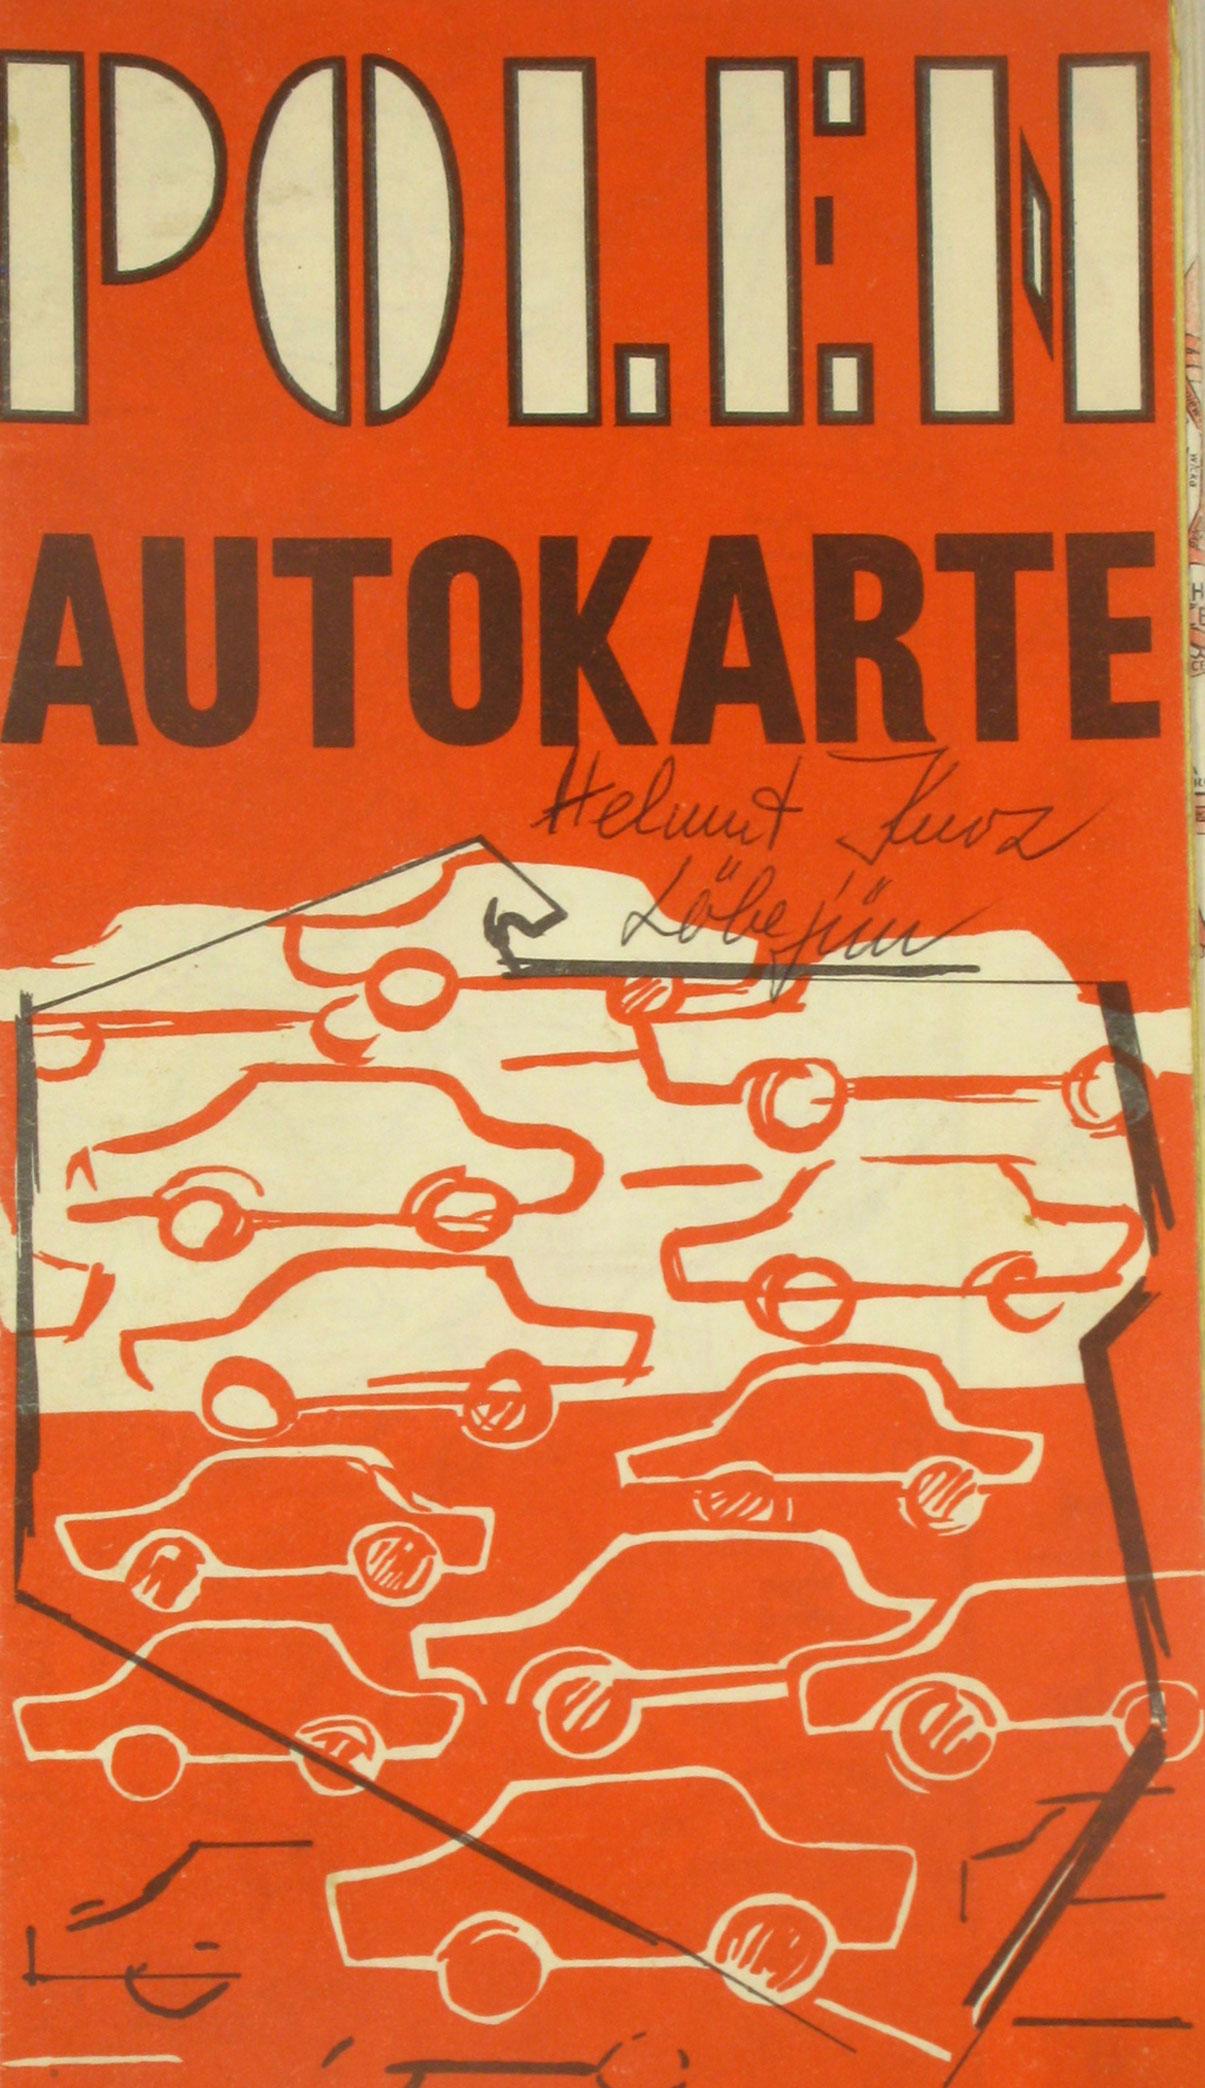 Autokarte Polen,: Bad. topogr. Bureau